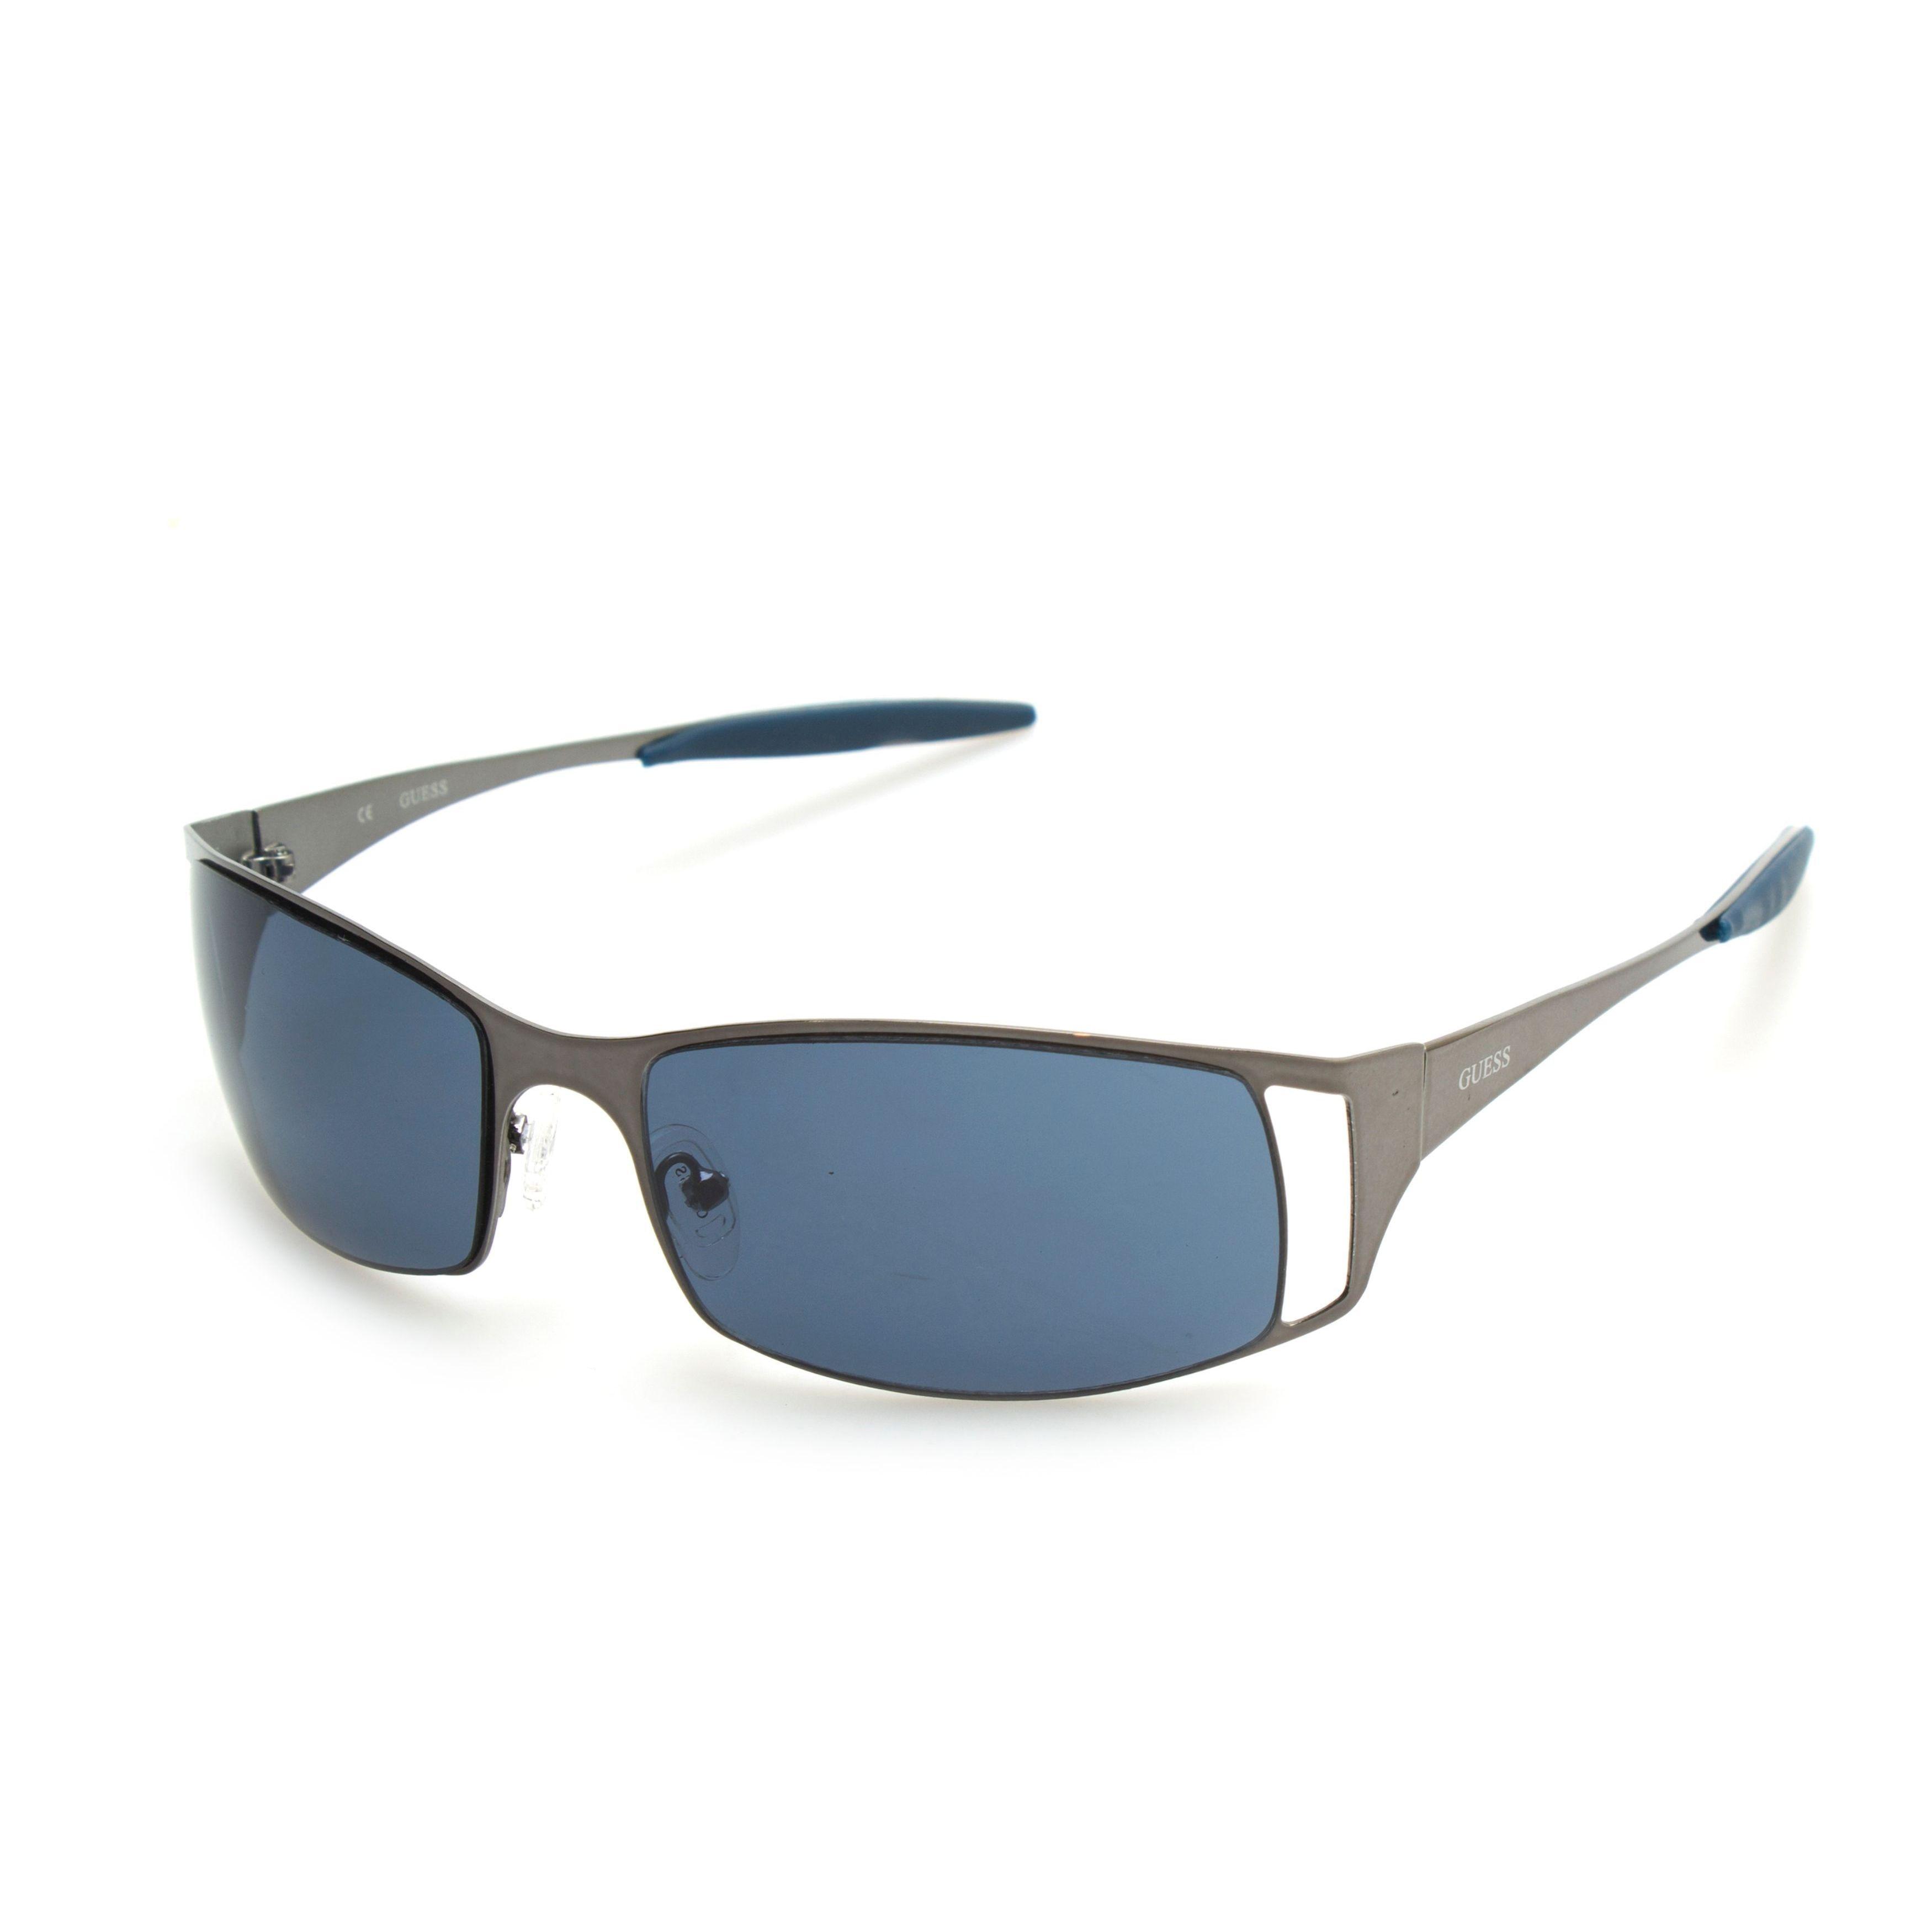 c2005fc770b Shop GUESS GU6248 Gunmetal Metal Rectangular Frame Men s Sunglasses - Free  Shipping On Orders Over  45 - Overstock - 11353036